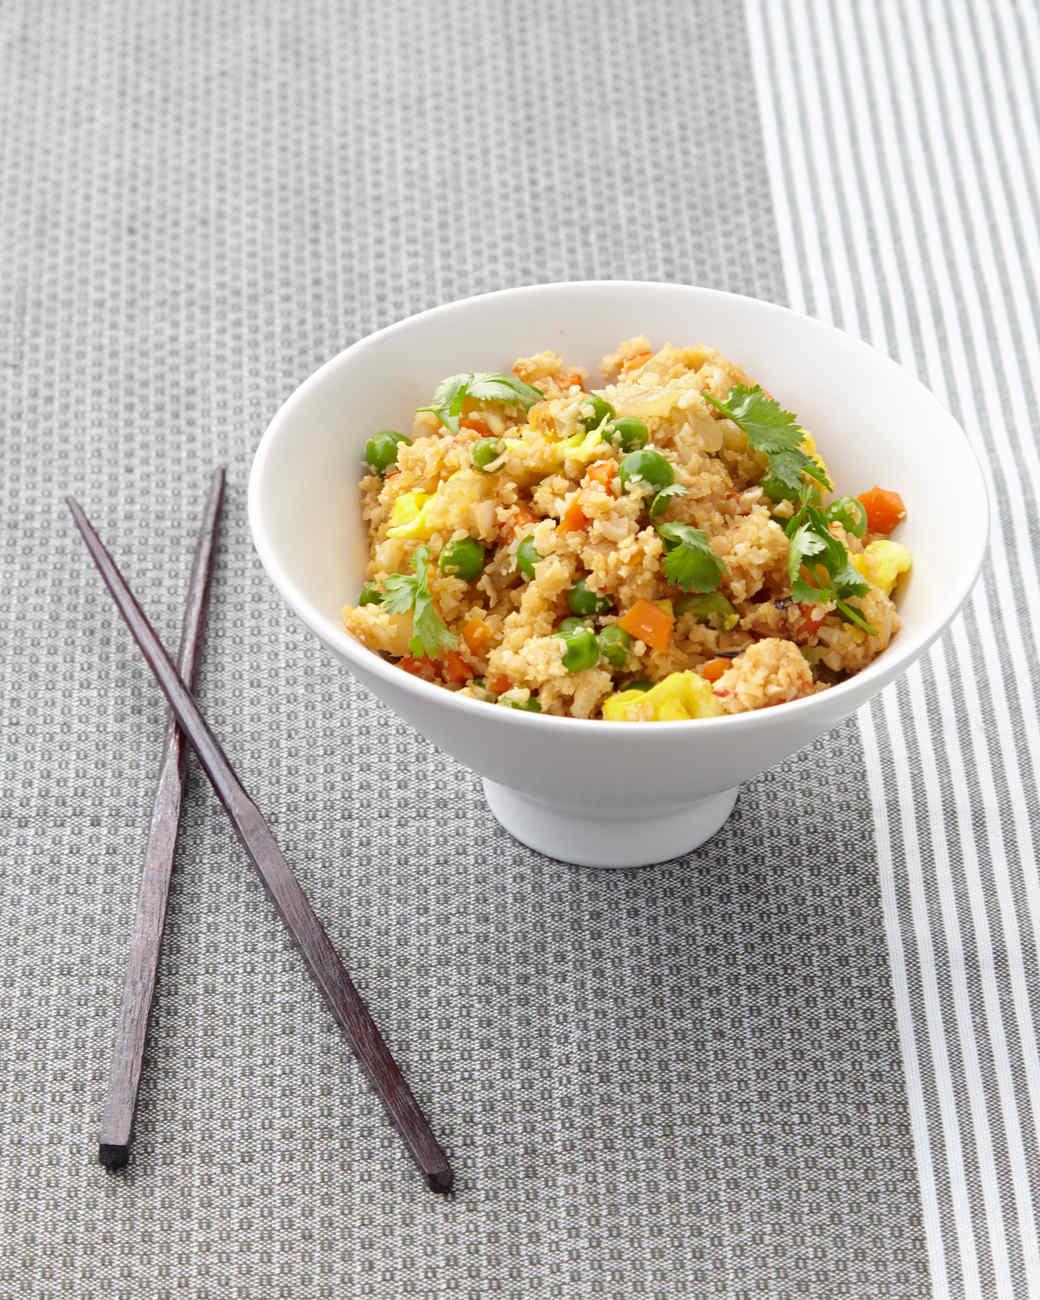 cauliflower-fried-rice-0023-d112283.jpg